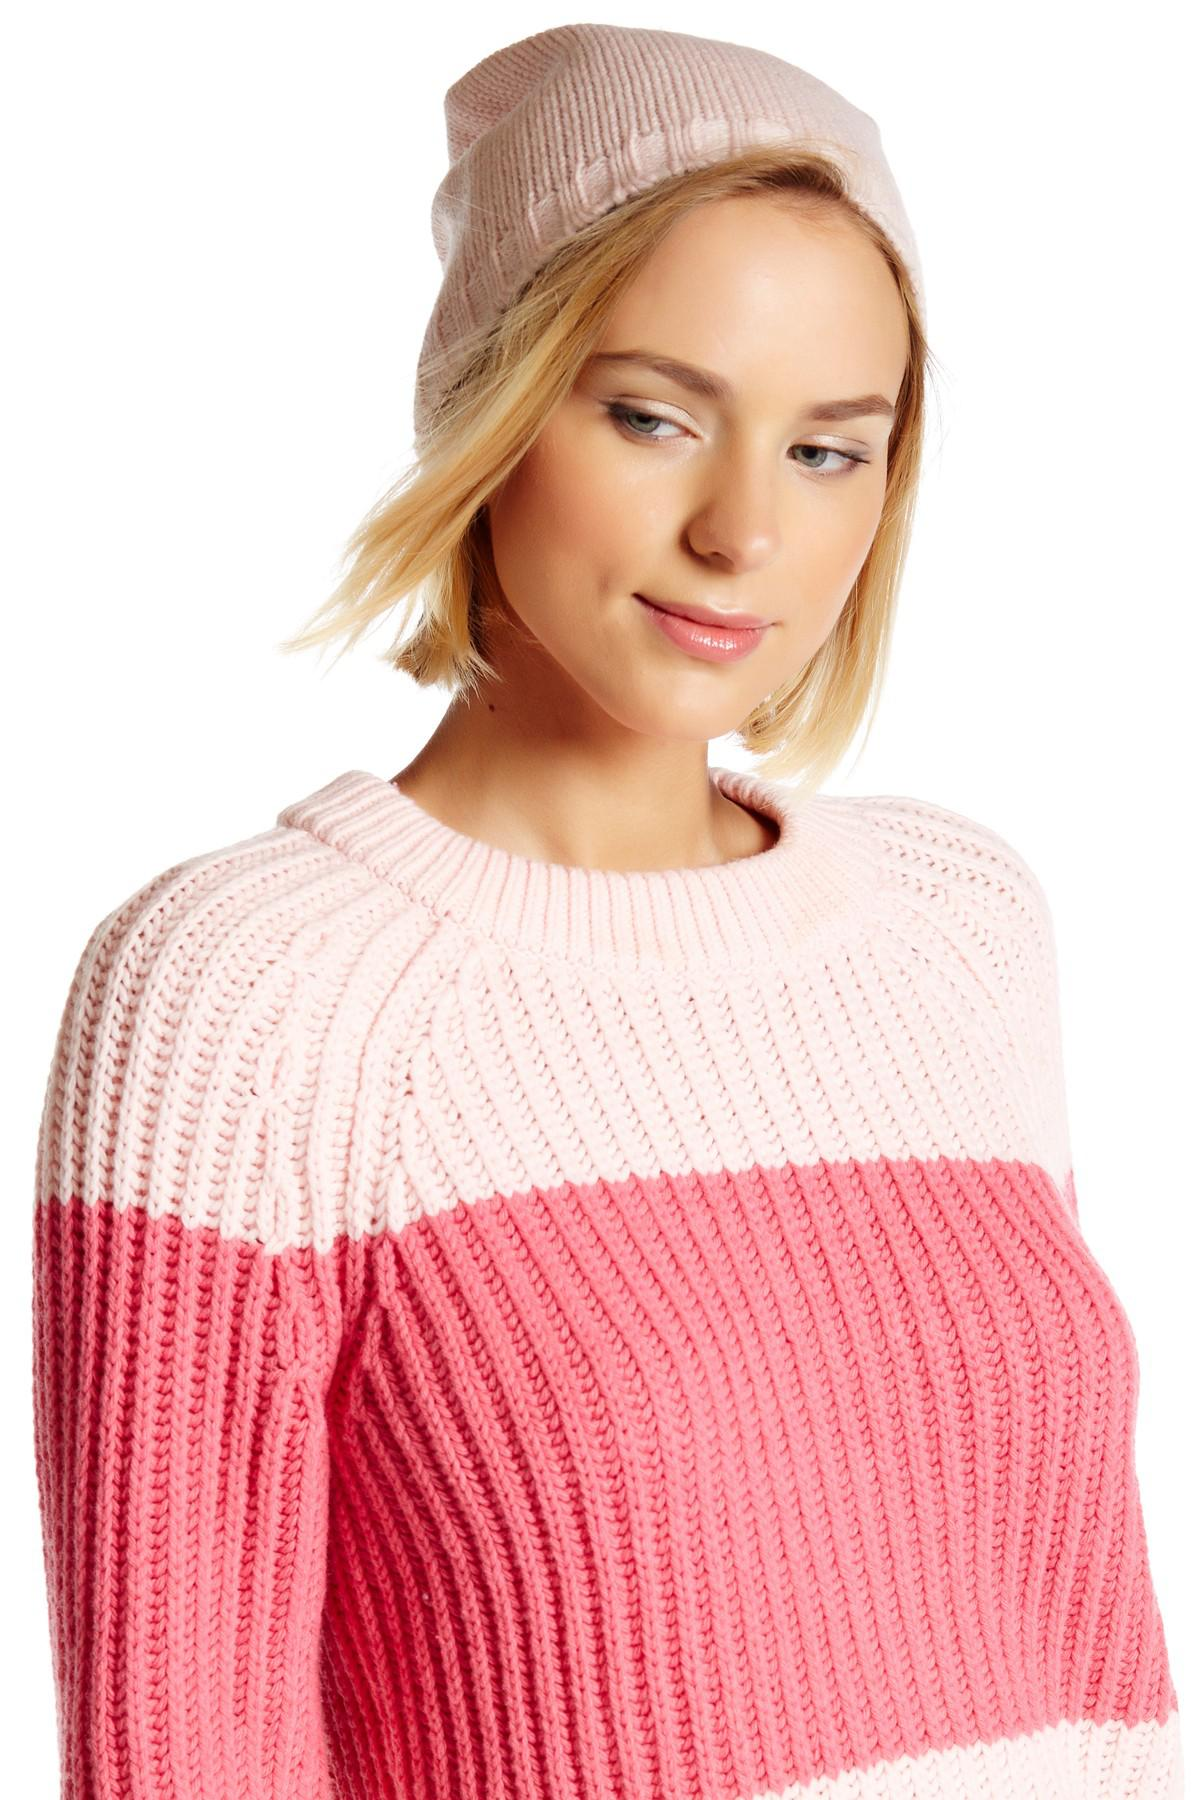 19a7b2ffd7e17 Lyst - Kate Spade Gathered Bow Beanie in Pink